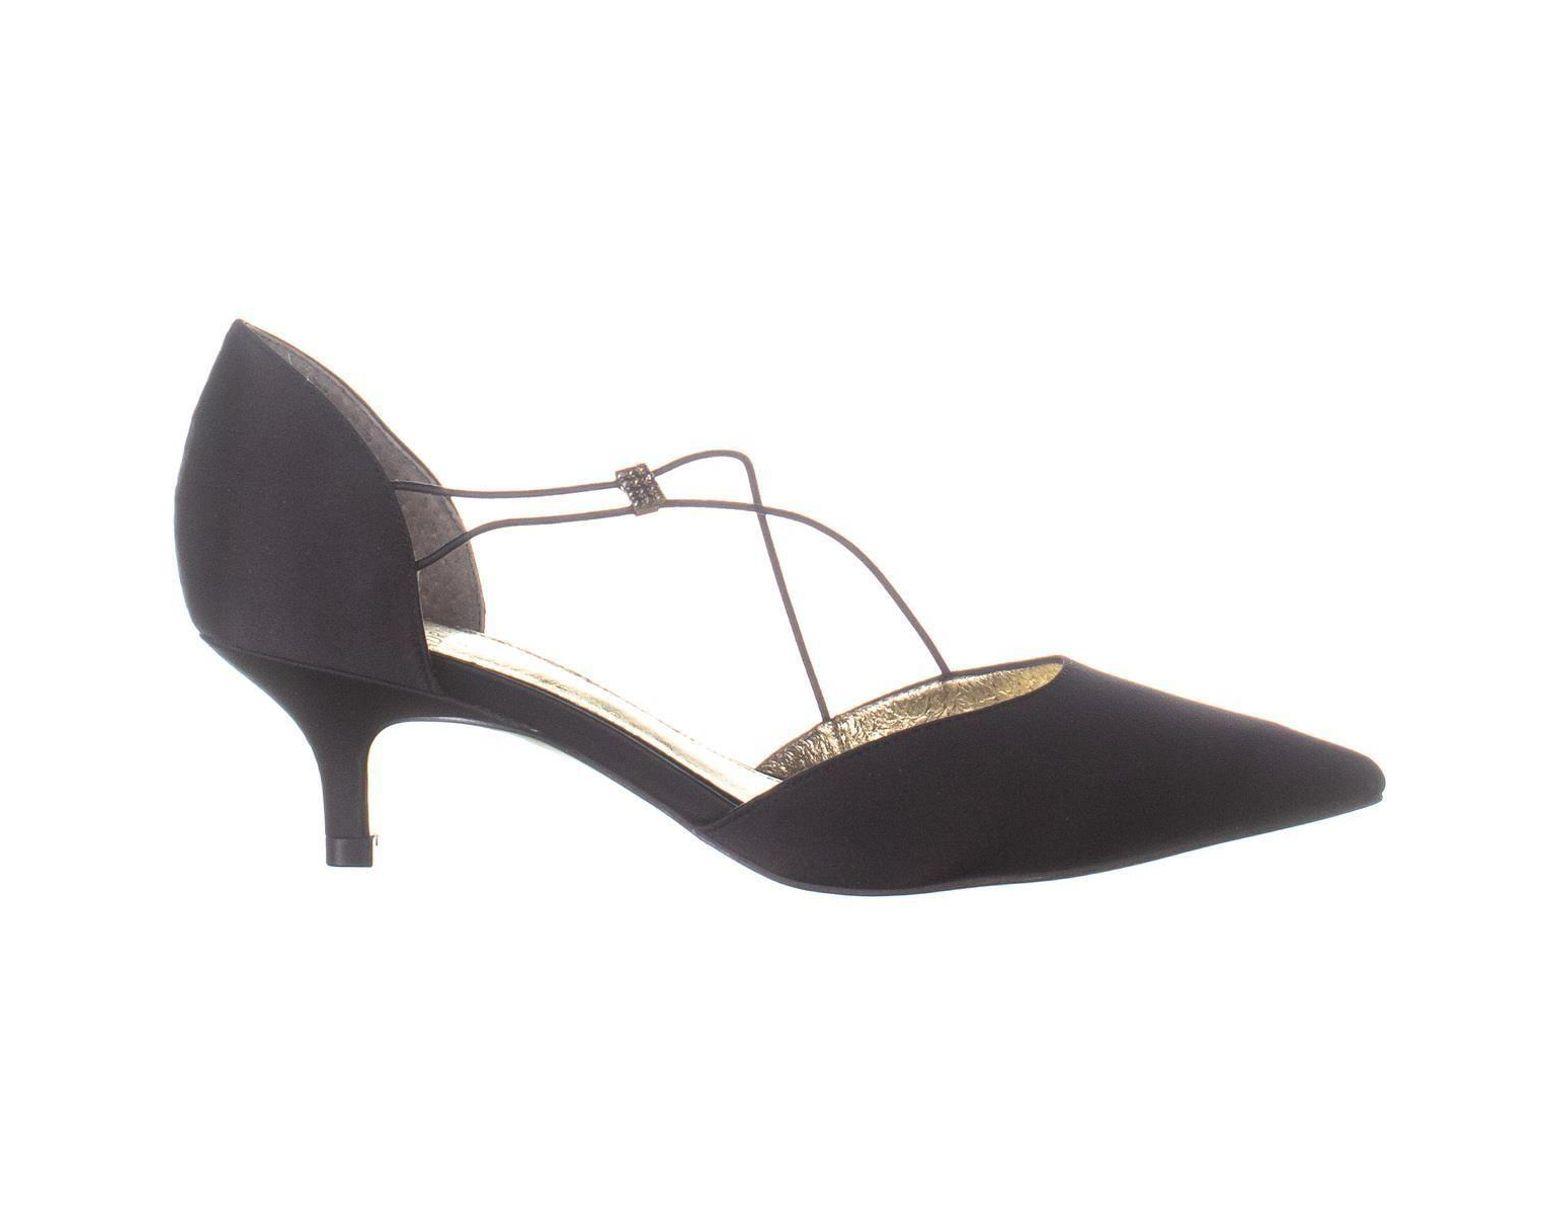 616ca3009a4d0 Adrianna Papell Lacy Kitten Heels in Black - Lyst